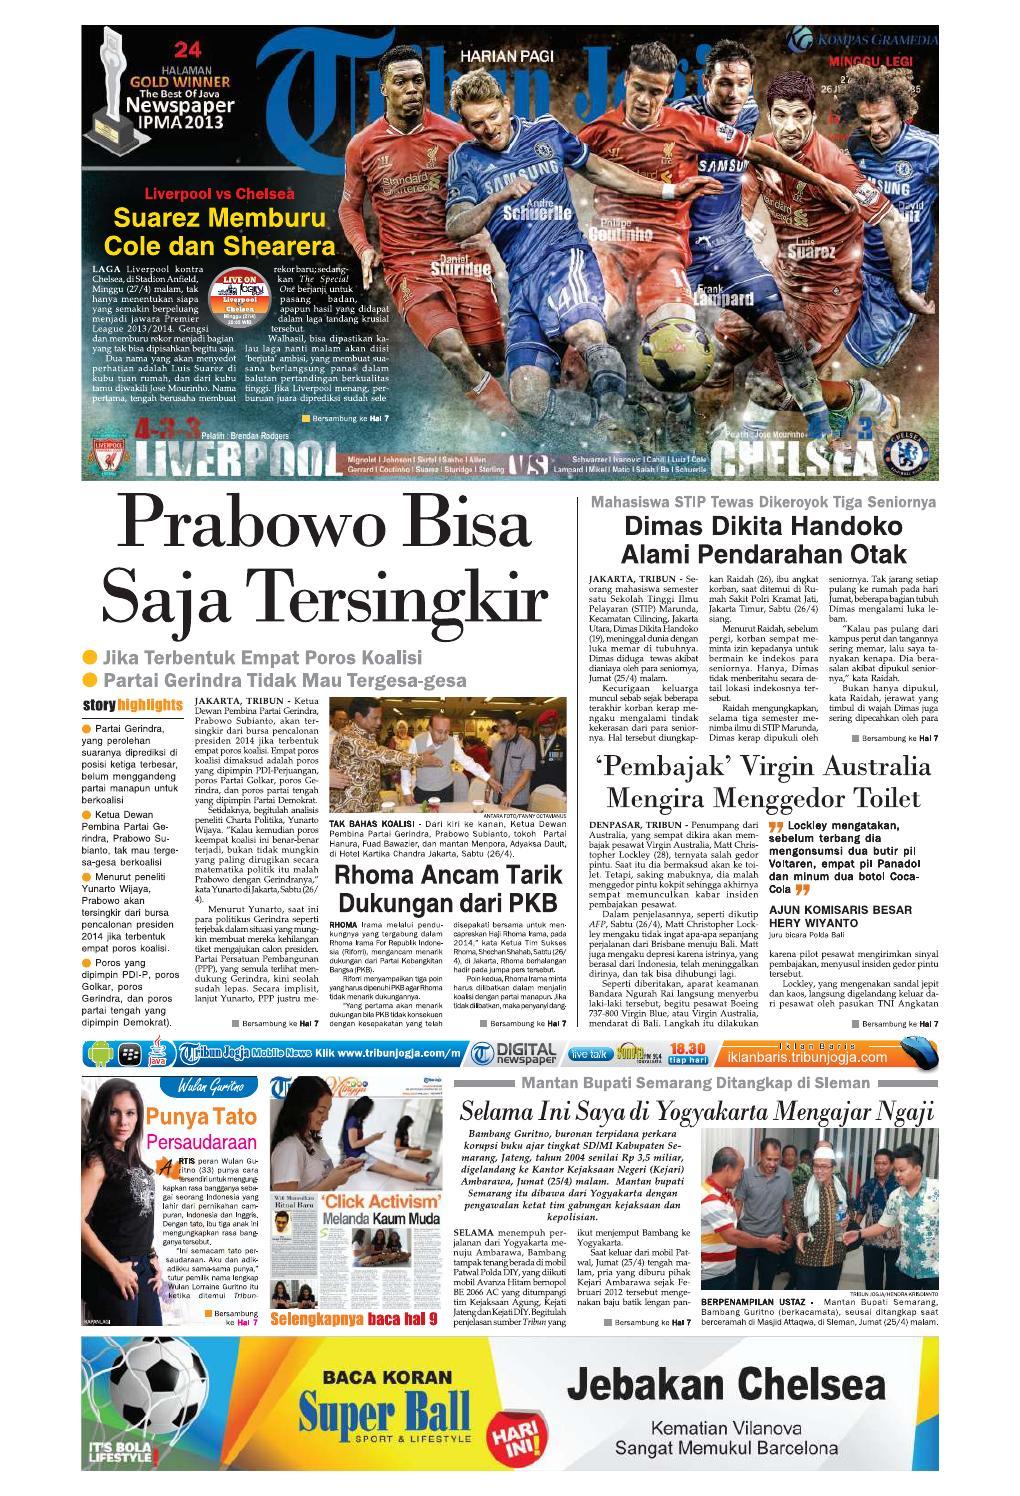 Tribunjogja 27 04 2014 by tribun jogja issuu